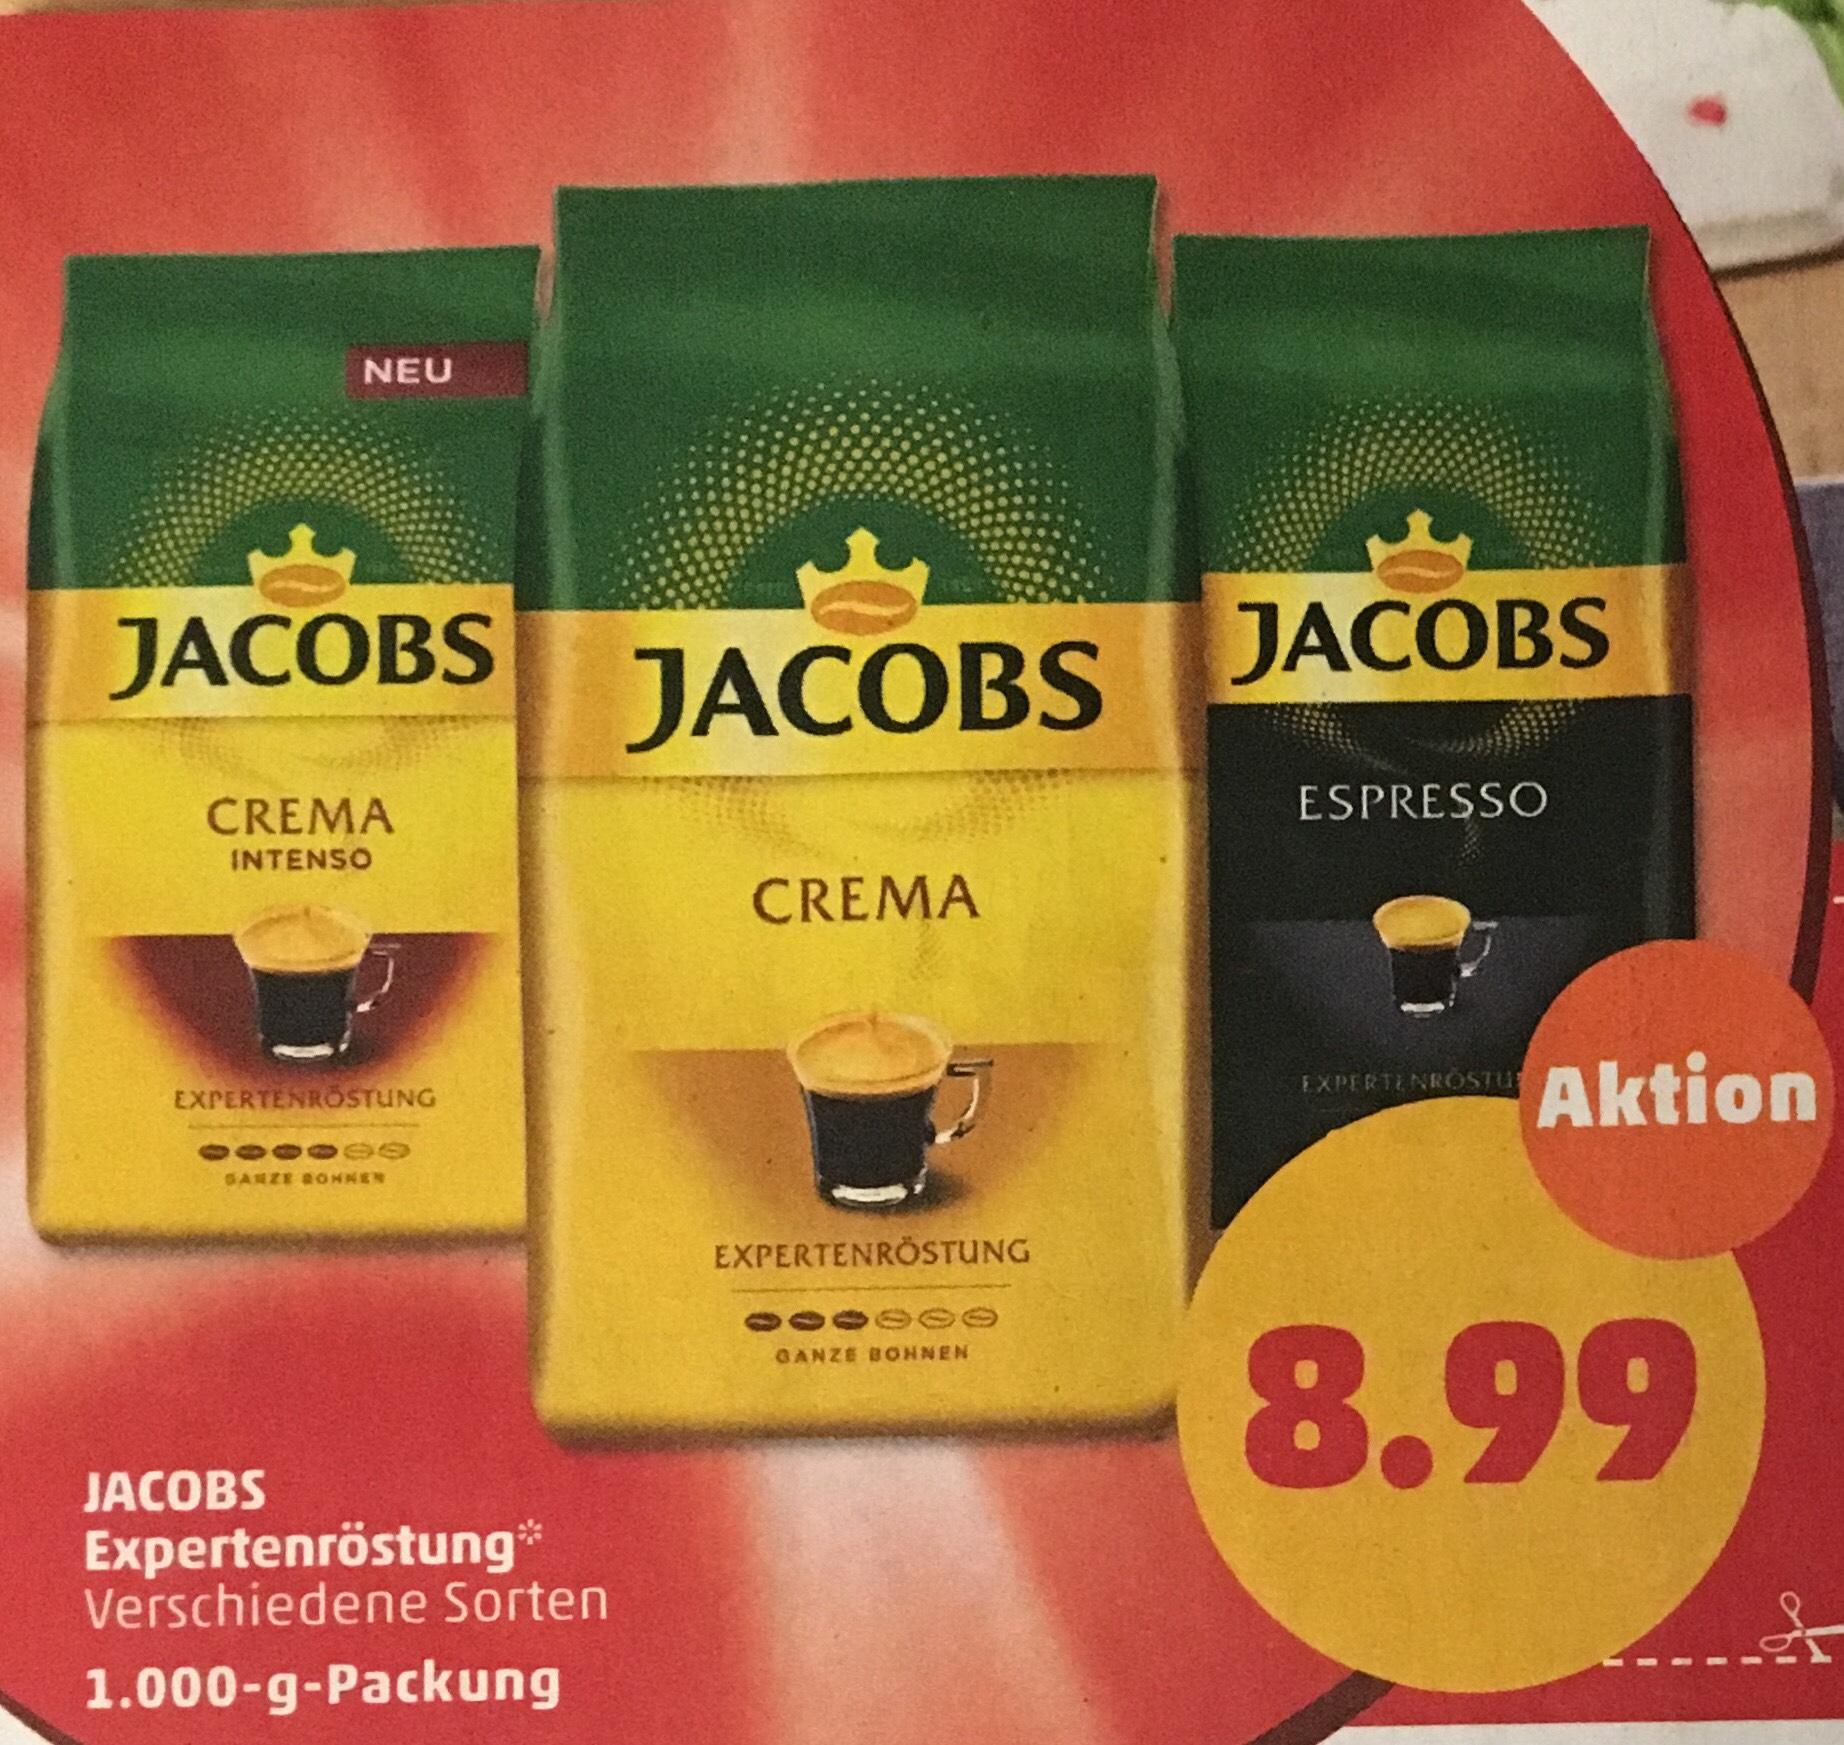 [Penny] ab 4.6. Jacobs Expertenröstung 1kg Packung für 6,99€ (Aktionspreis abzgl. Prospektcoupon)